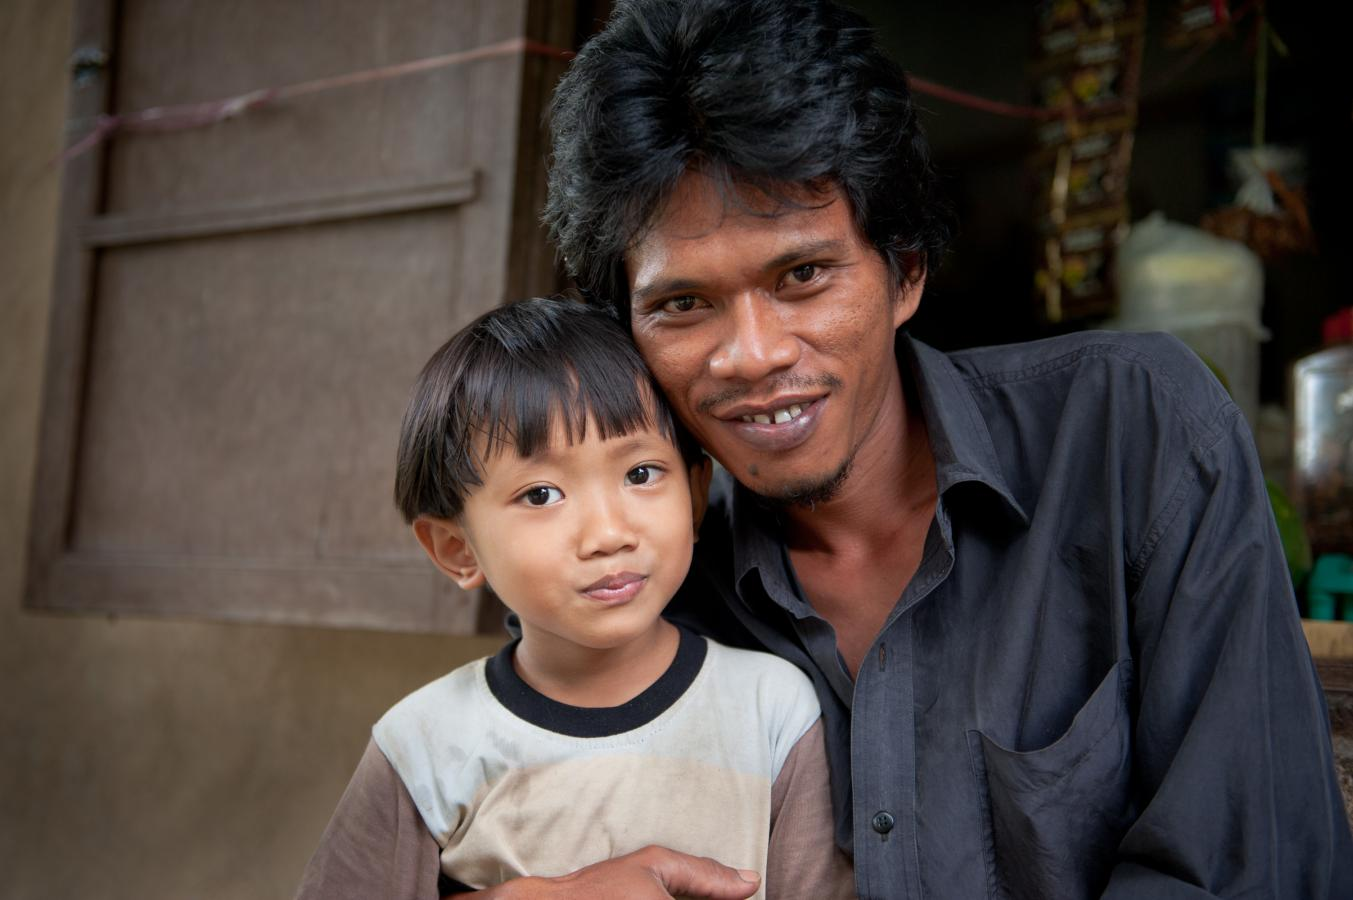 father-and-son-somewhere-around-sidemen-bali-2010